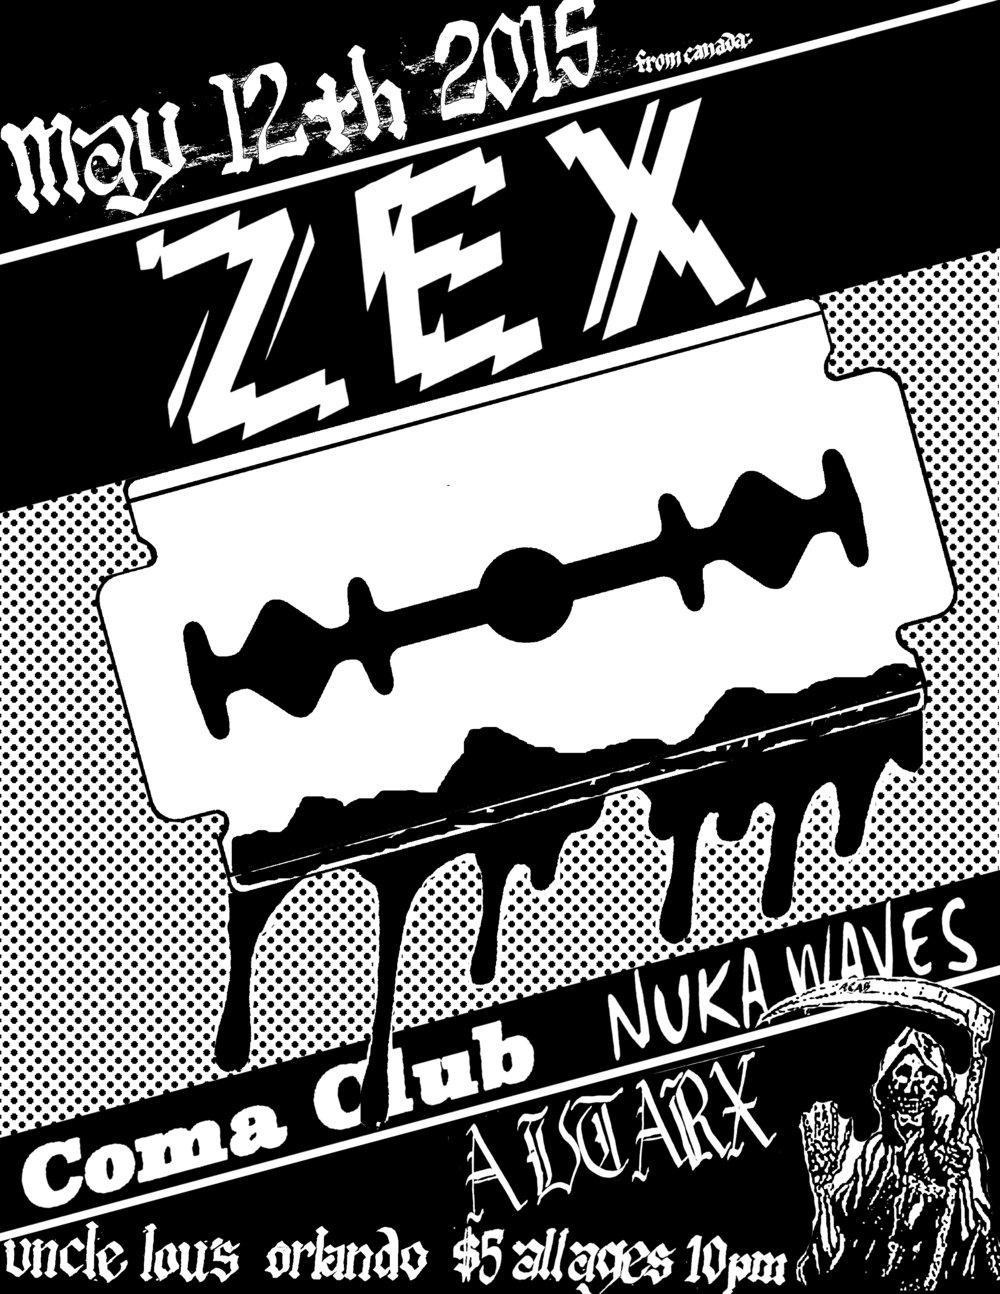 flyer-15.05.12-orlando-zex.jpg